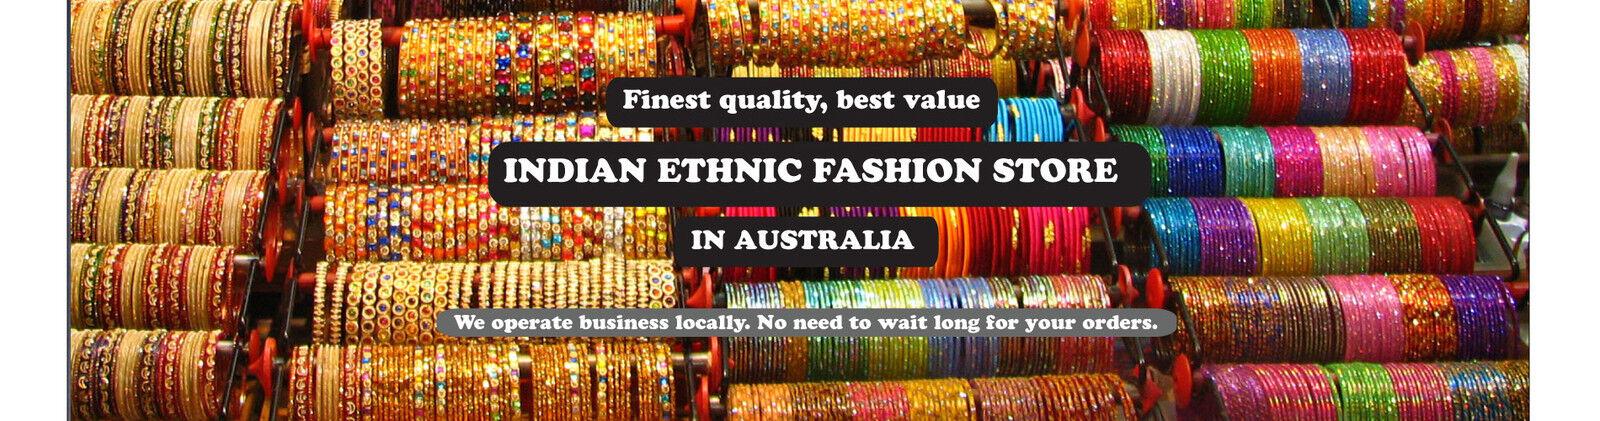 INCART Indian Store Australia